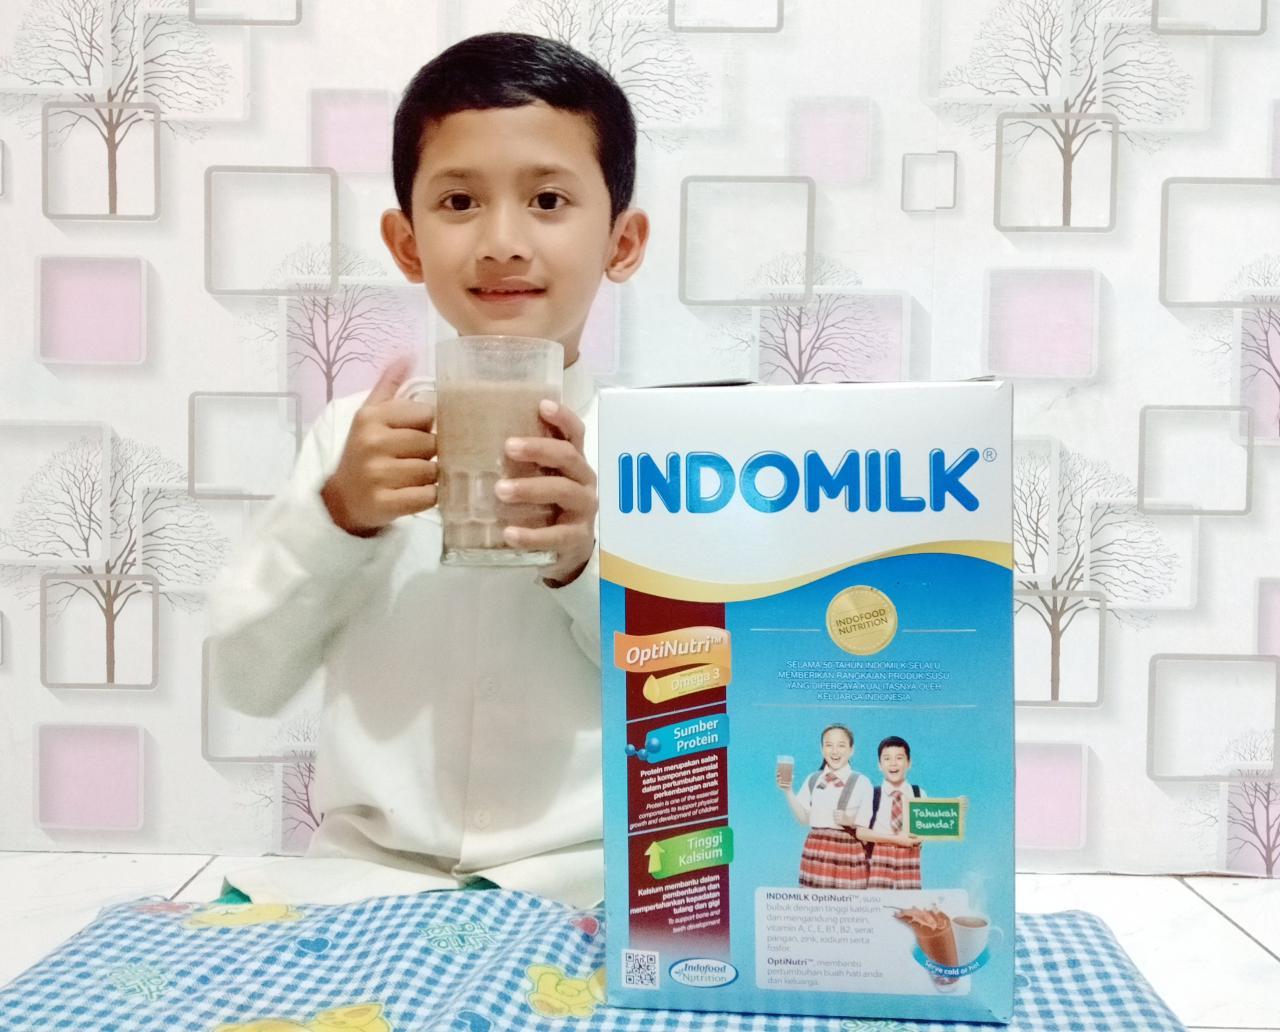 indomilk susu bubuk